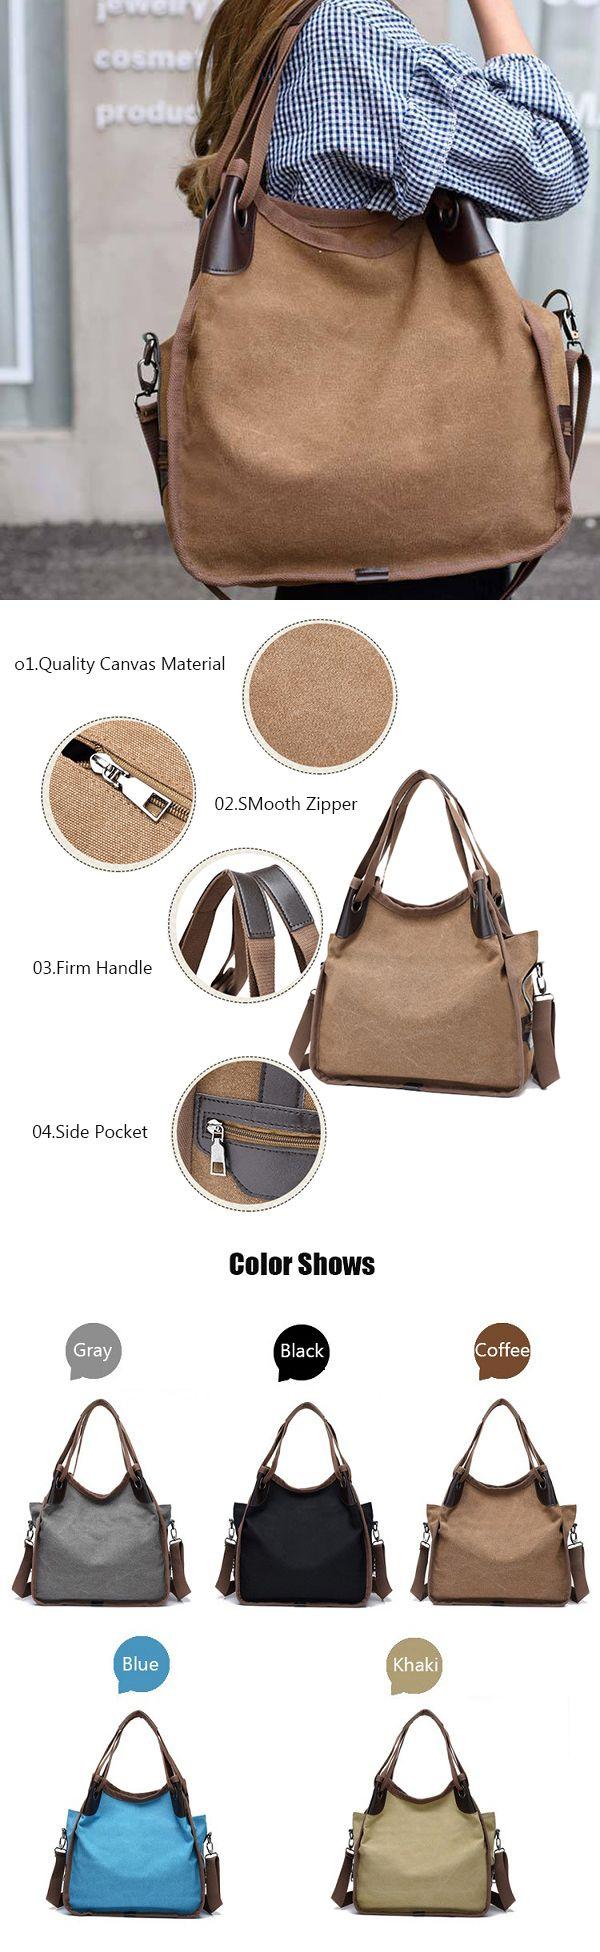 Women Canvas Handbag /Shoulder Bag: Large Capacity /Casual